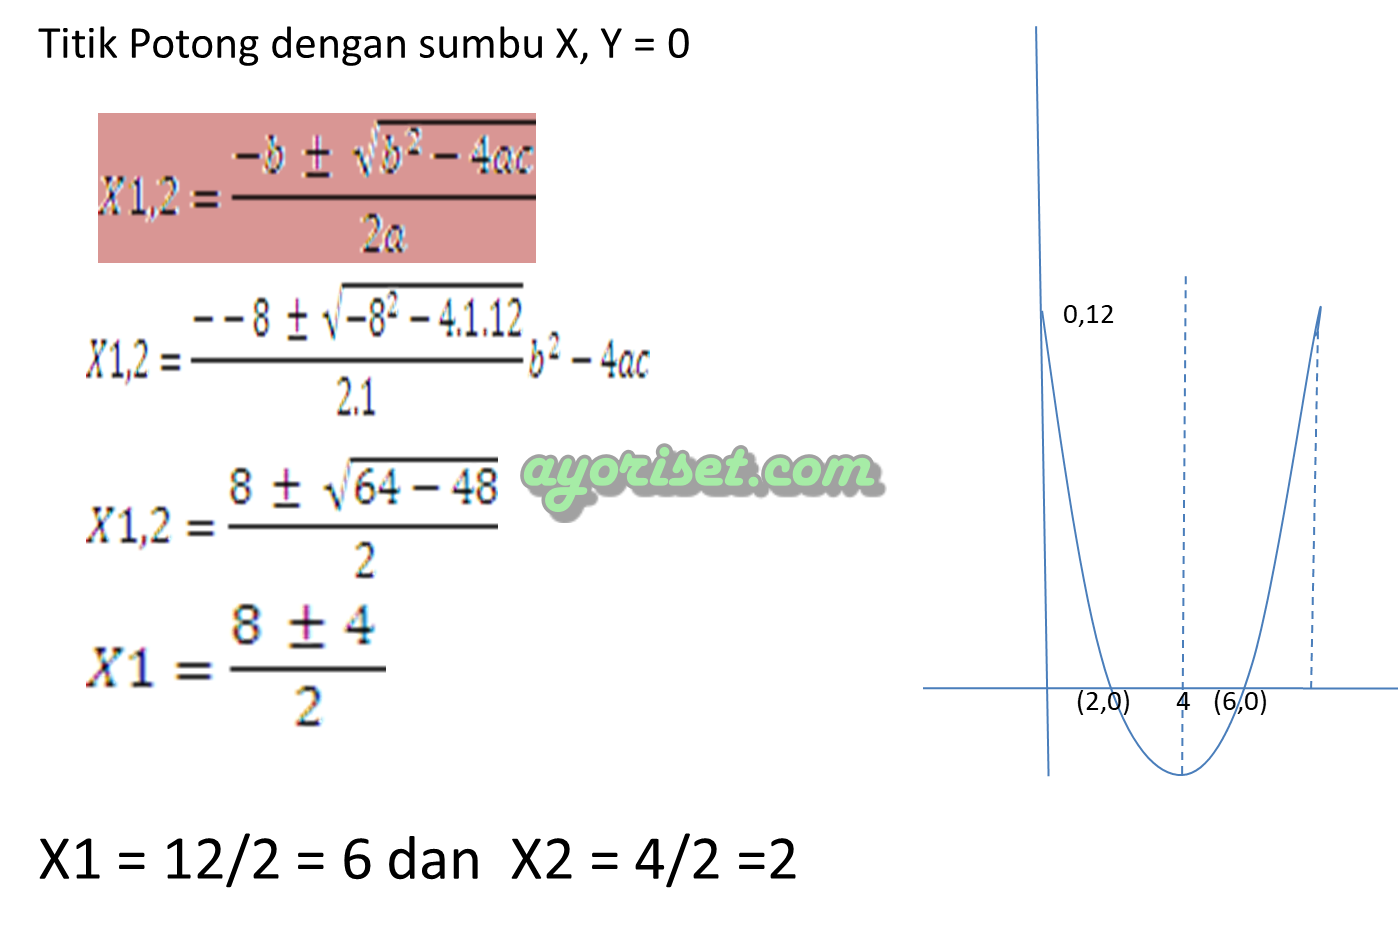 Contoh Soal Fungsi Non Linear Matematika Dan Jawabannya Contoh Soal Terbaru